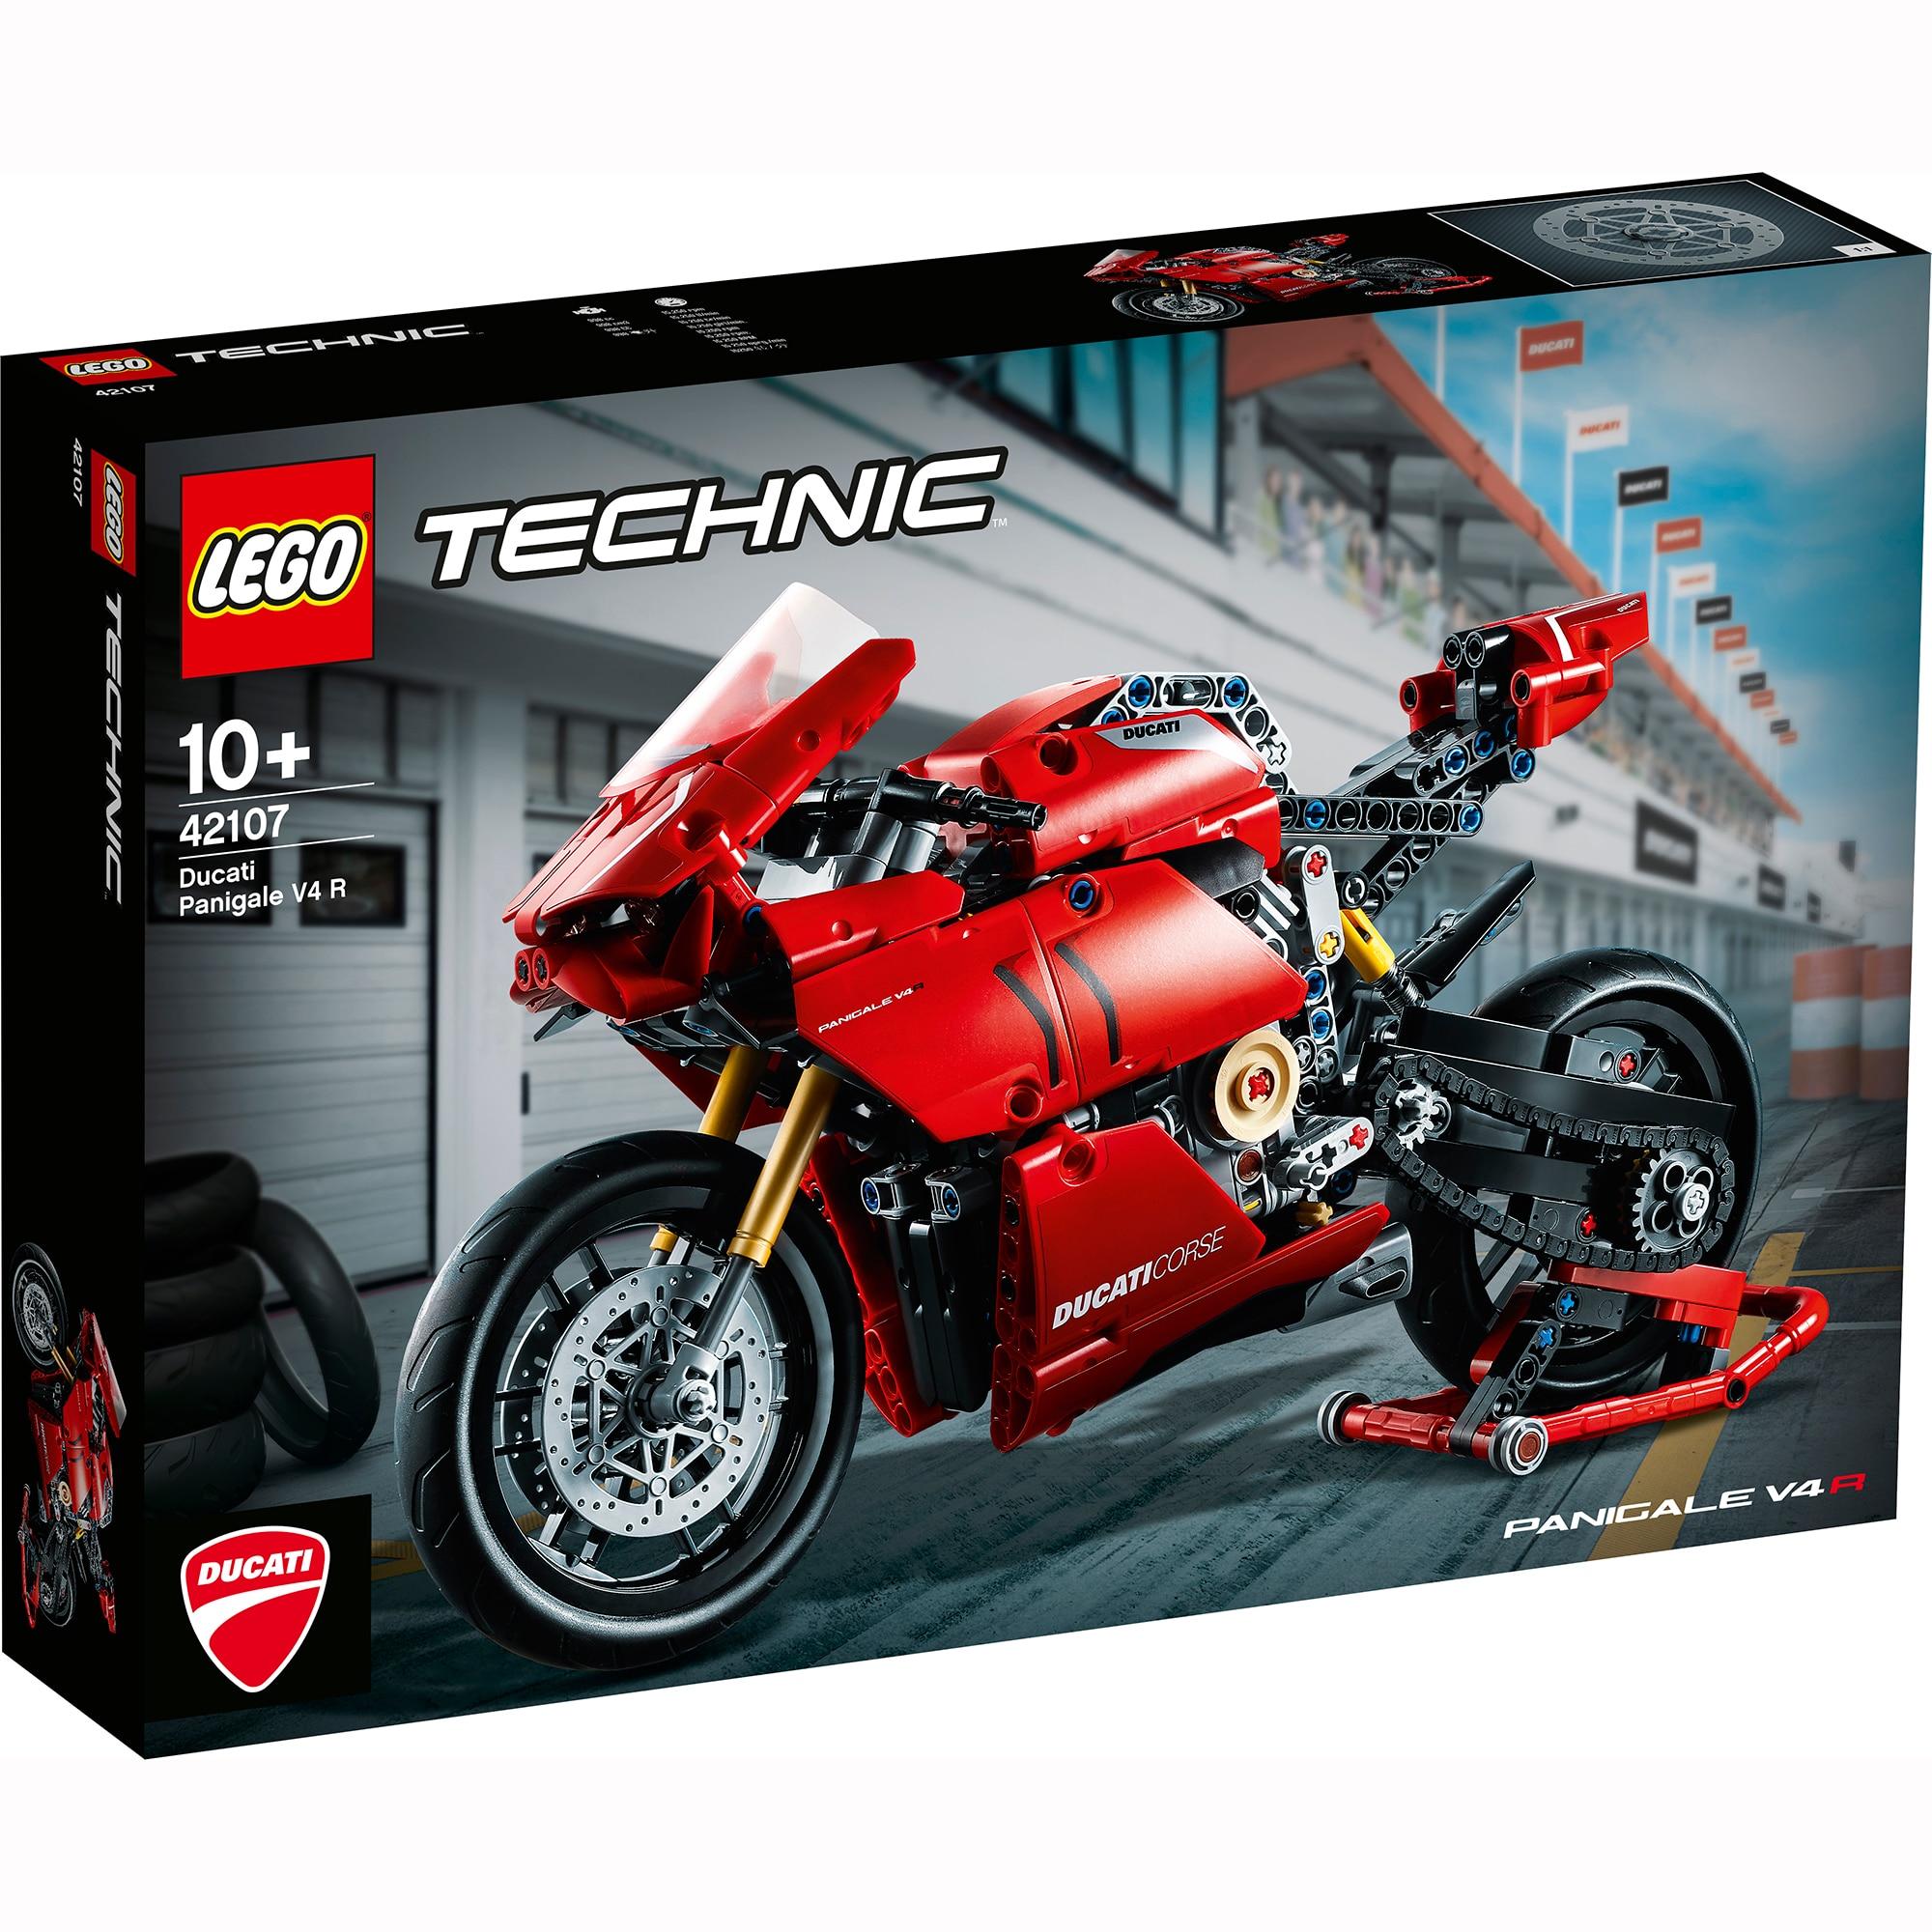 Fotografie LEGO Technic - Ducati Panigale V4 R 42107, 646 piese